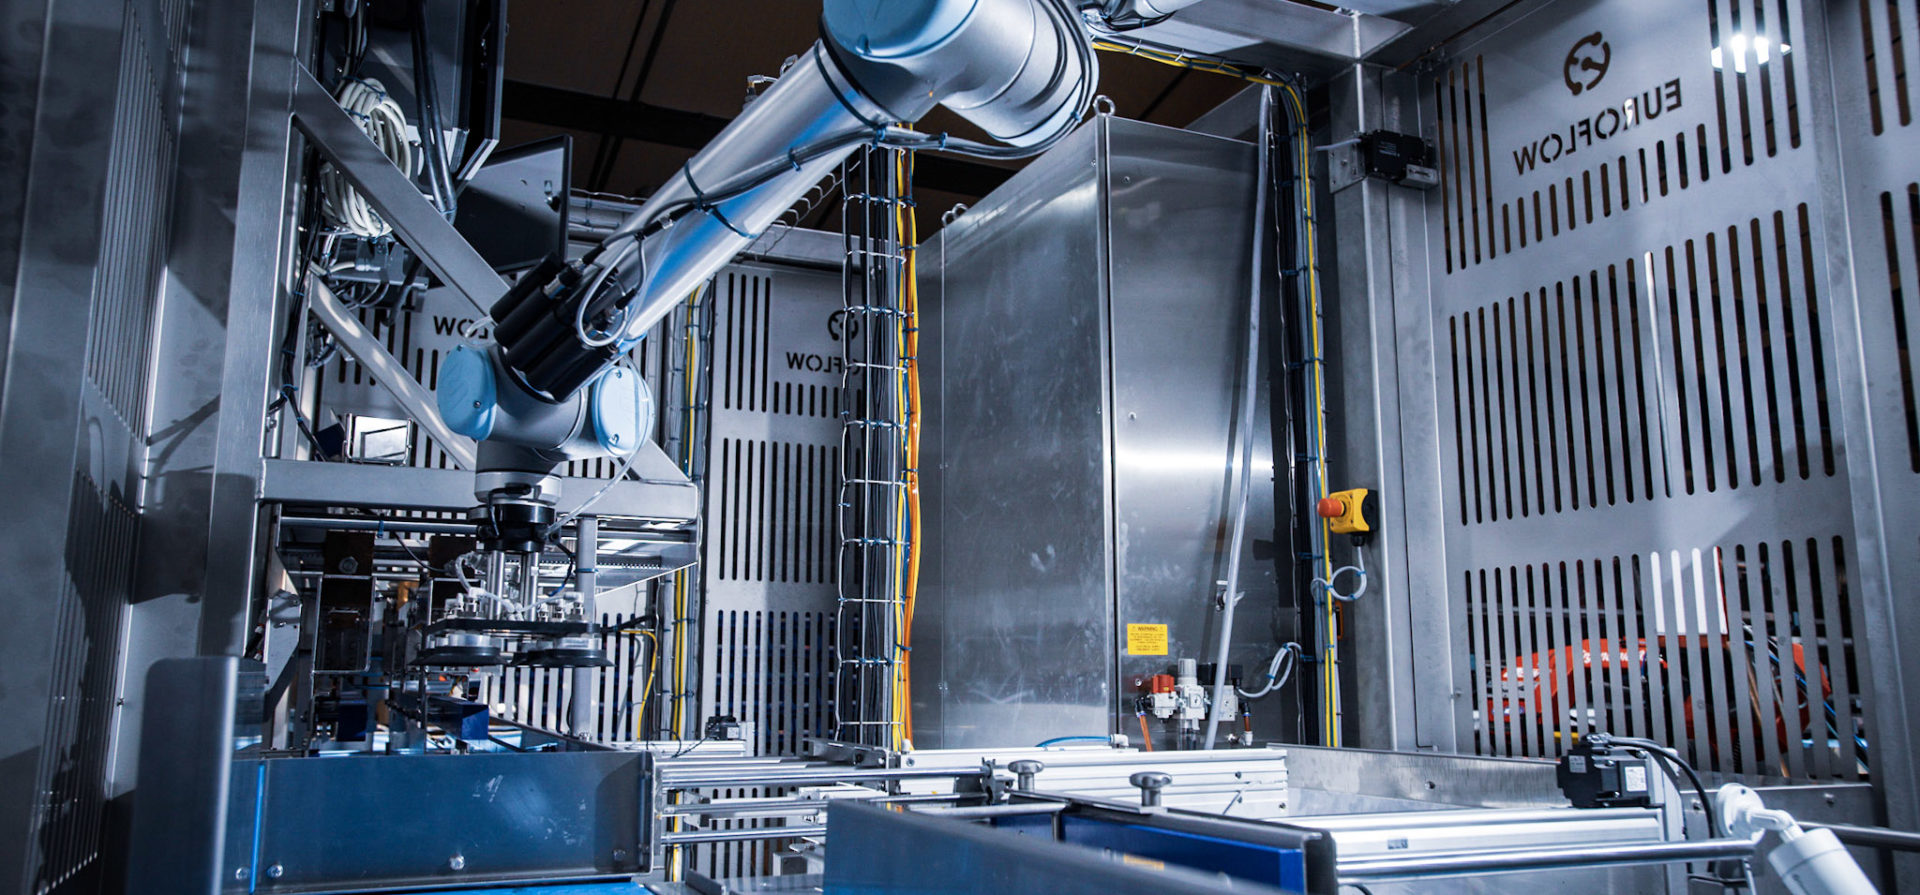 Bespoke Solutions - Wide Project Scope | Euroflow Automation Ltd